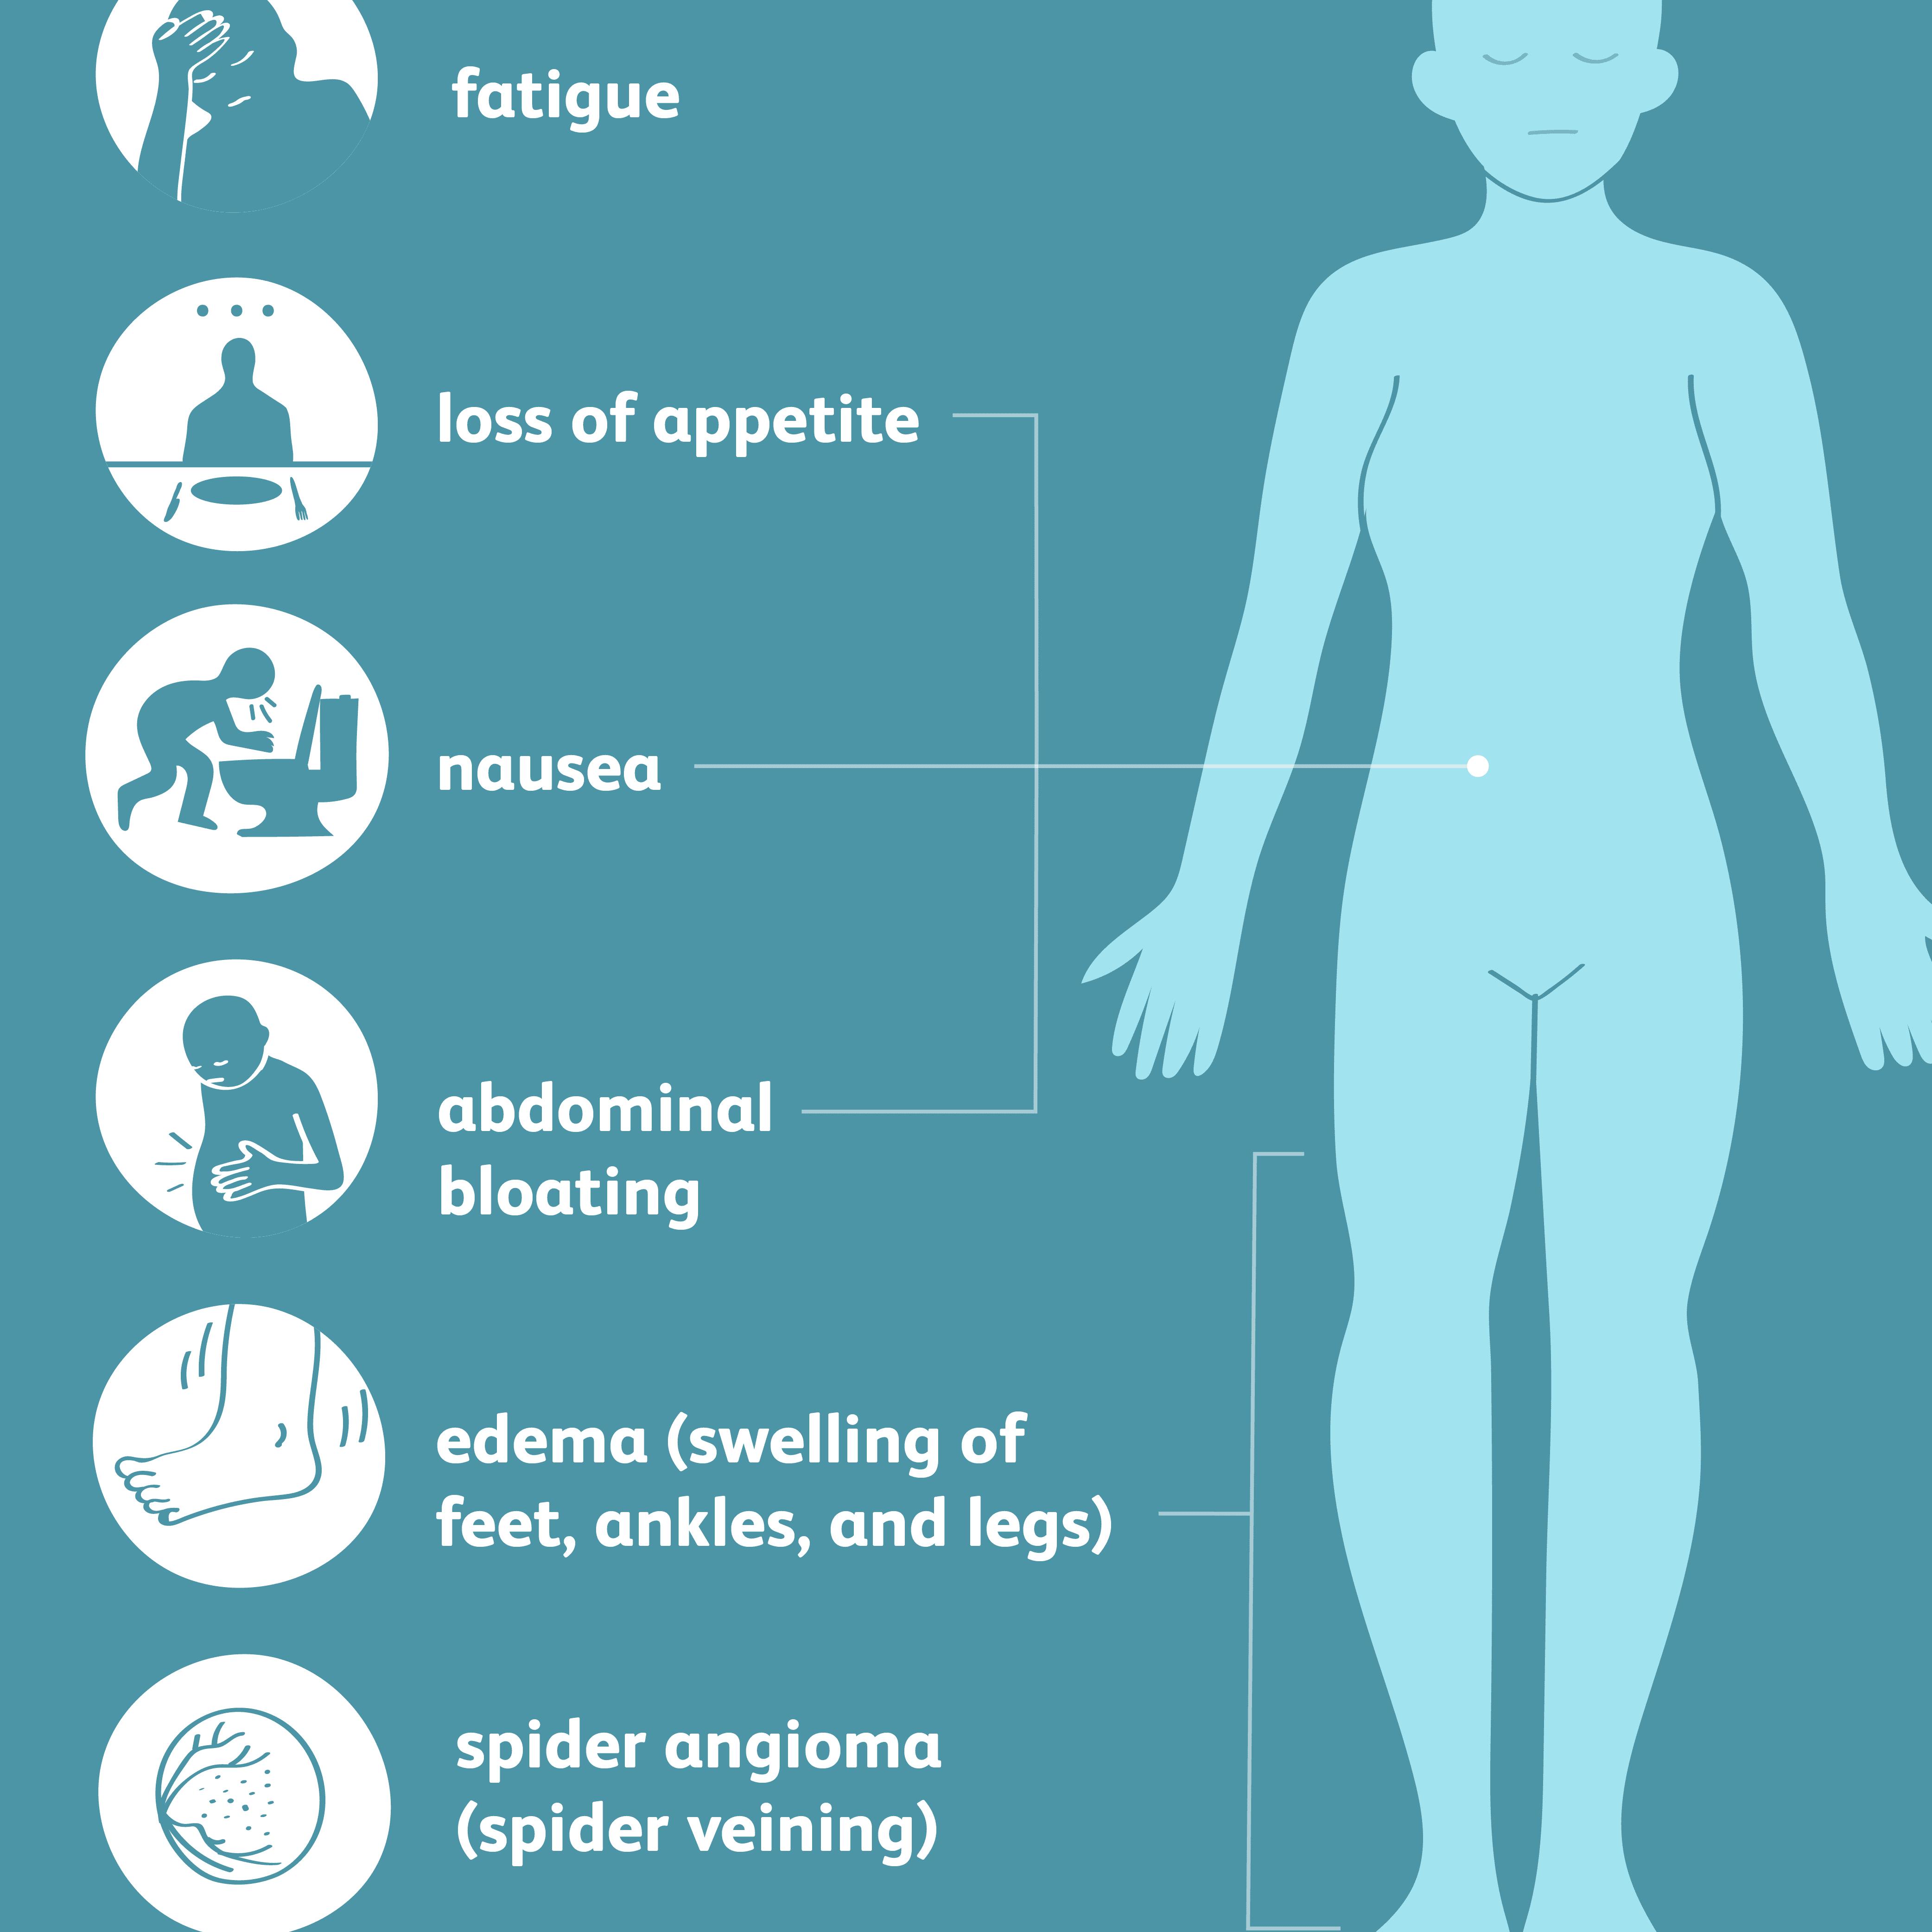 common symptoms of cirrhosis